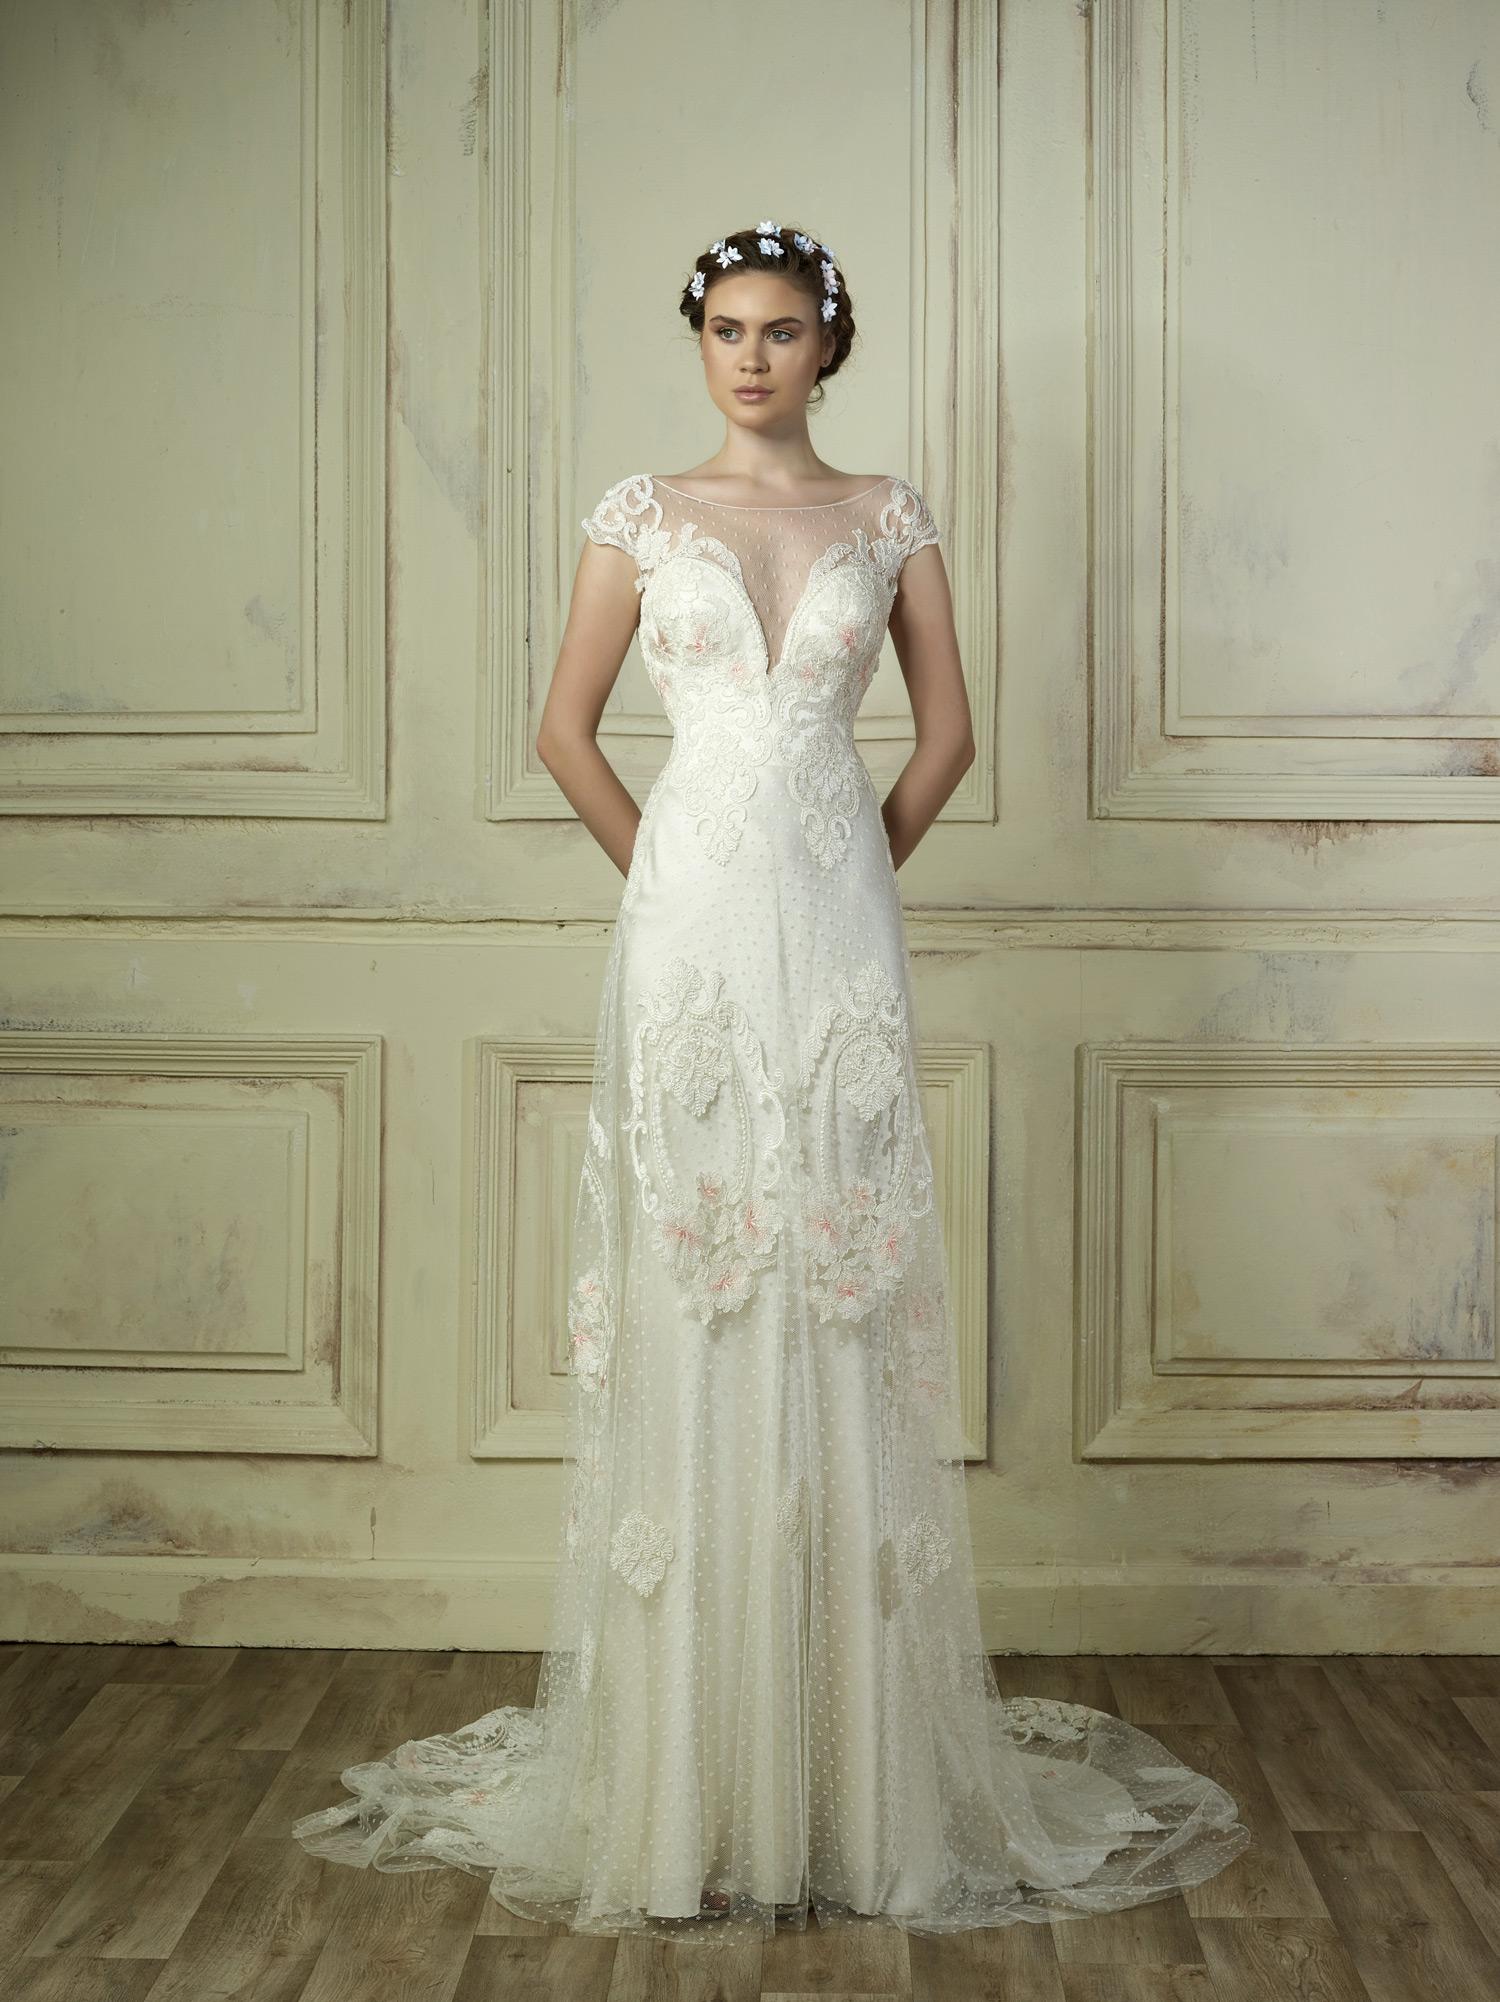 gemy maalouf illusion off-the-shoulder wedding dress spring 2018